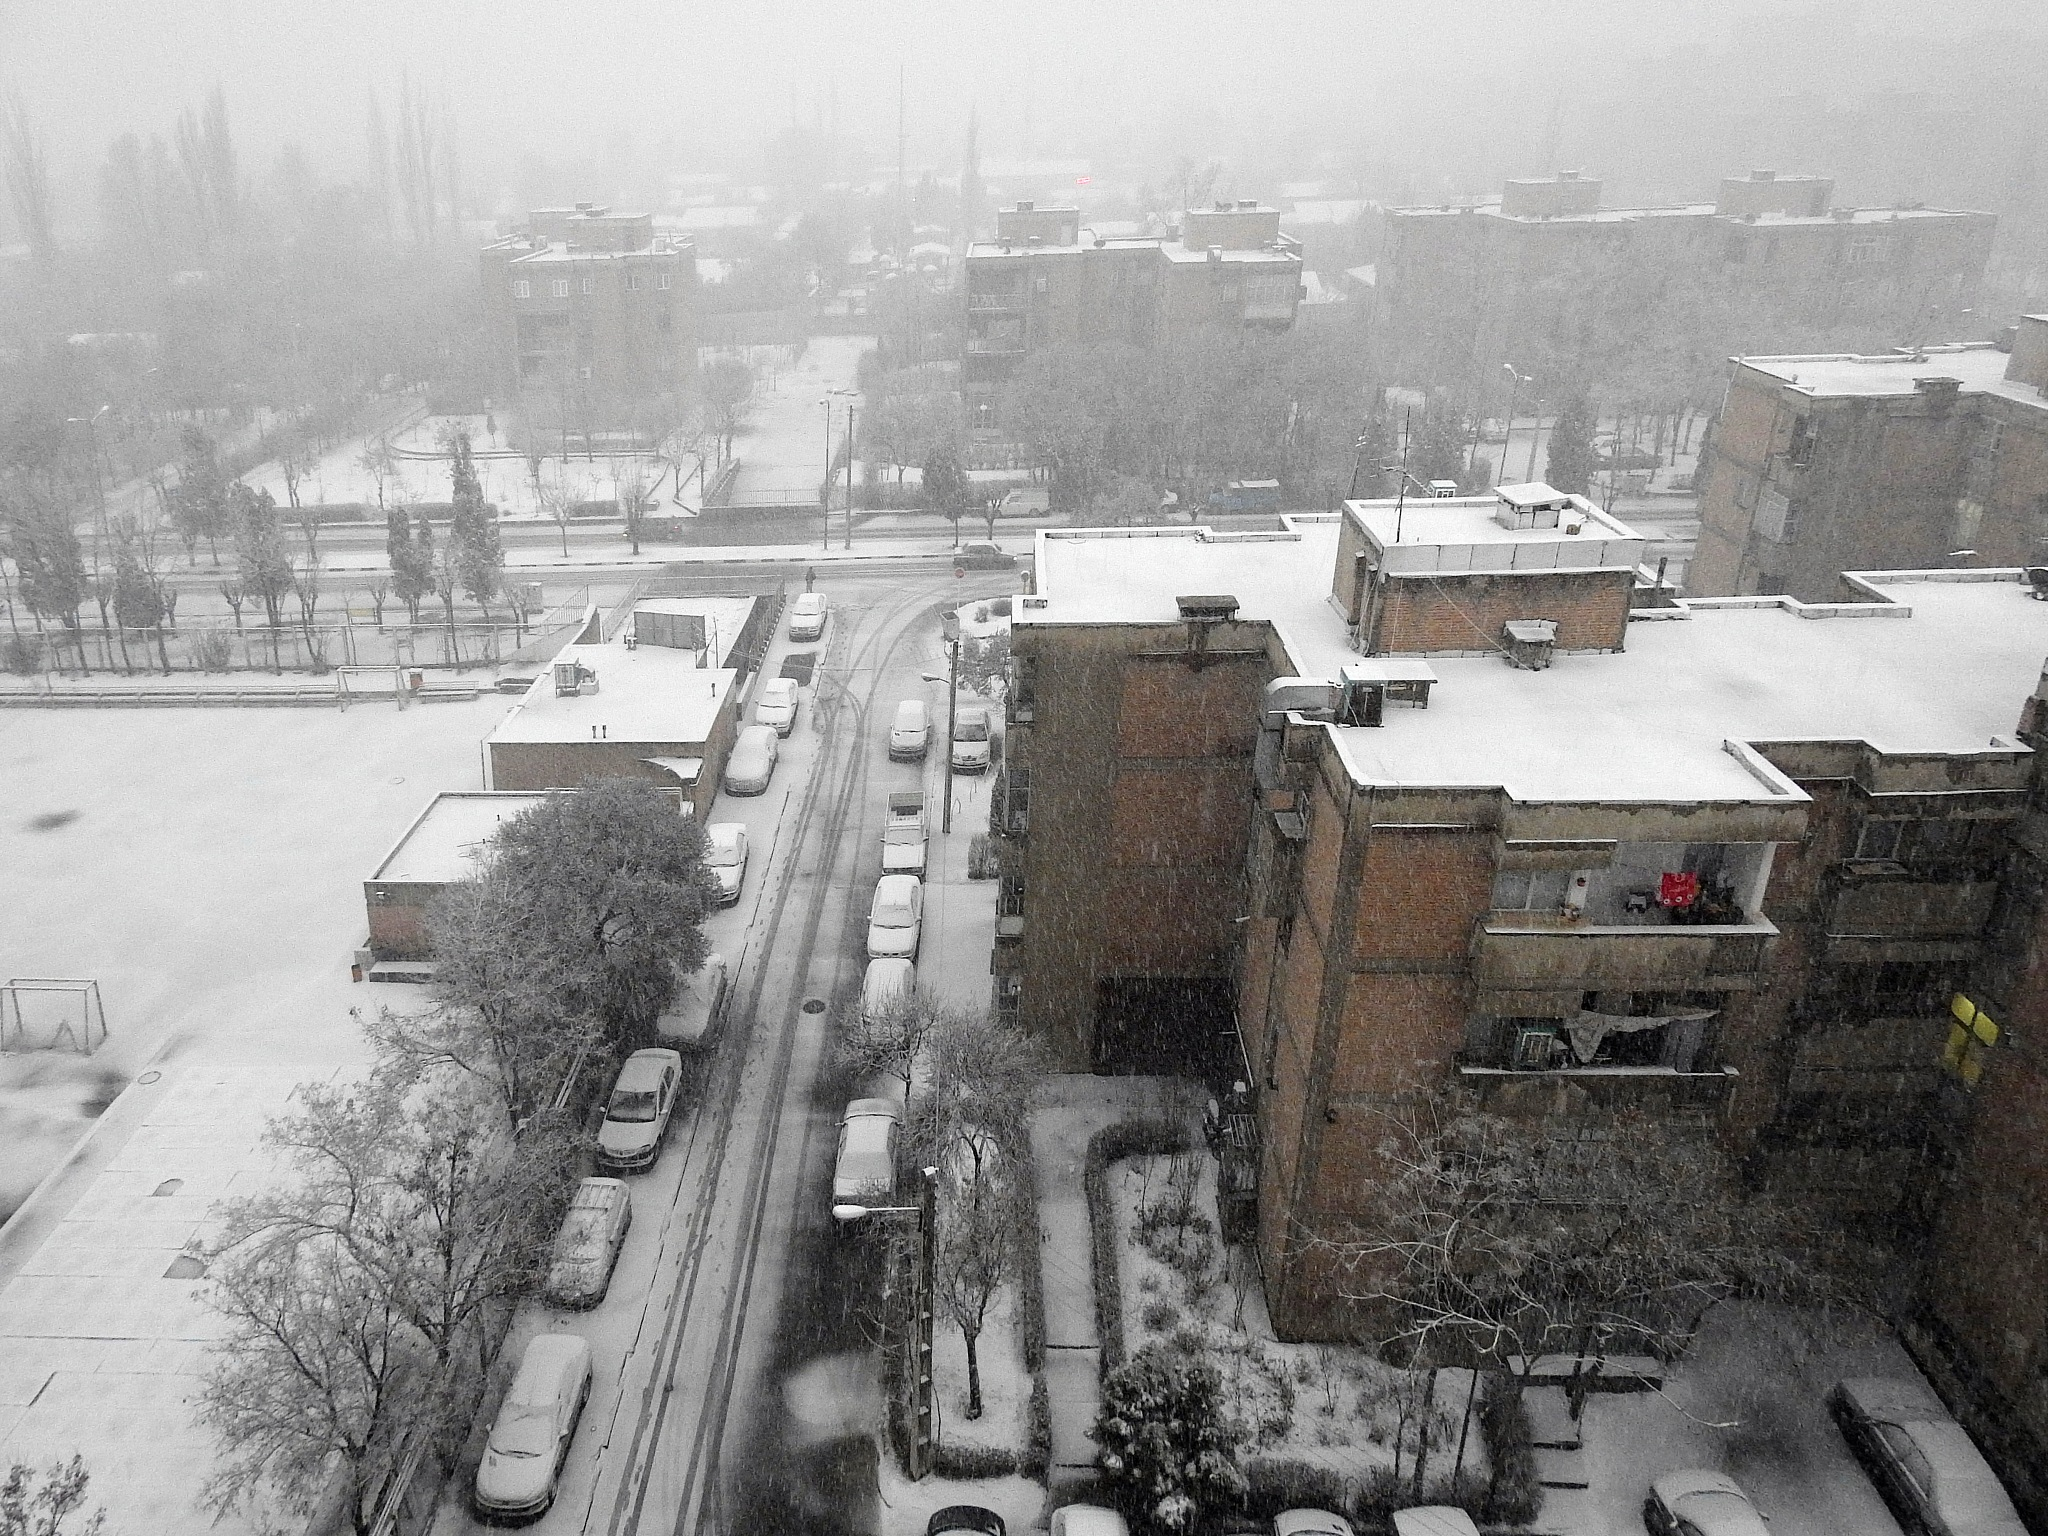 snowy day by Aahmad Hezavei